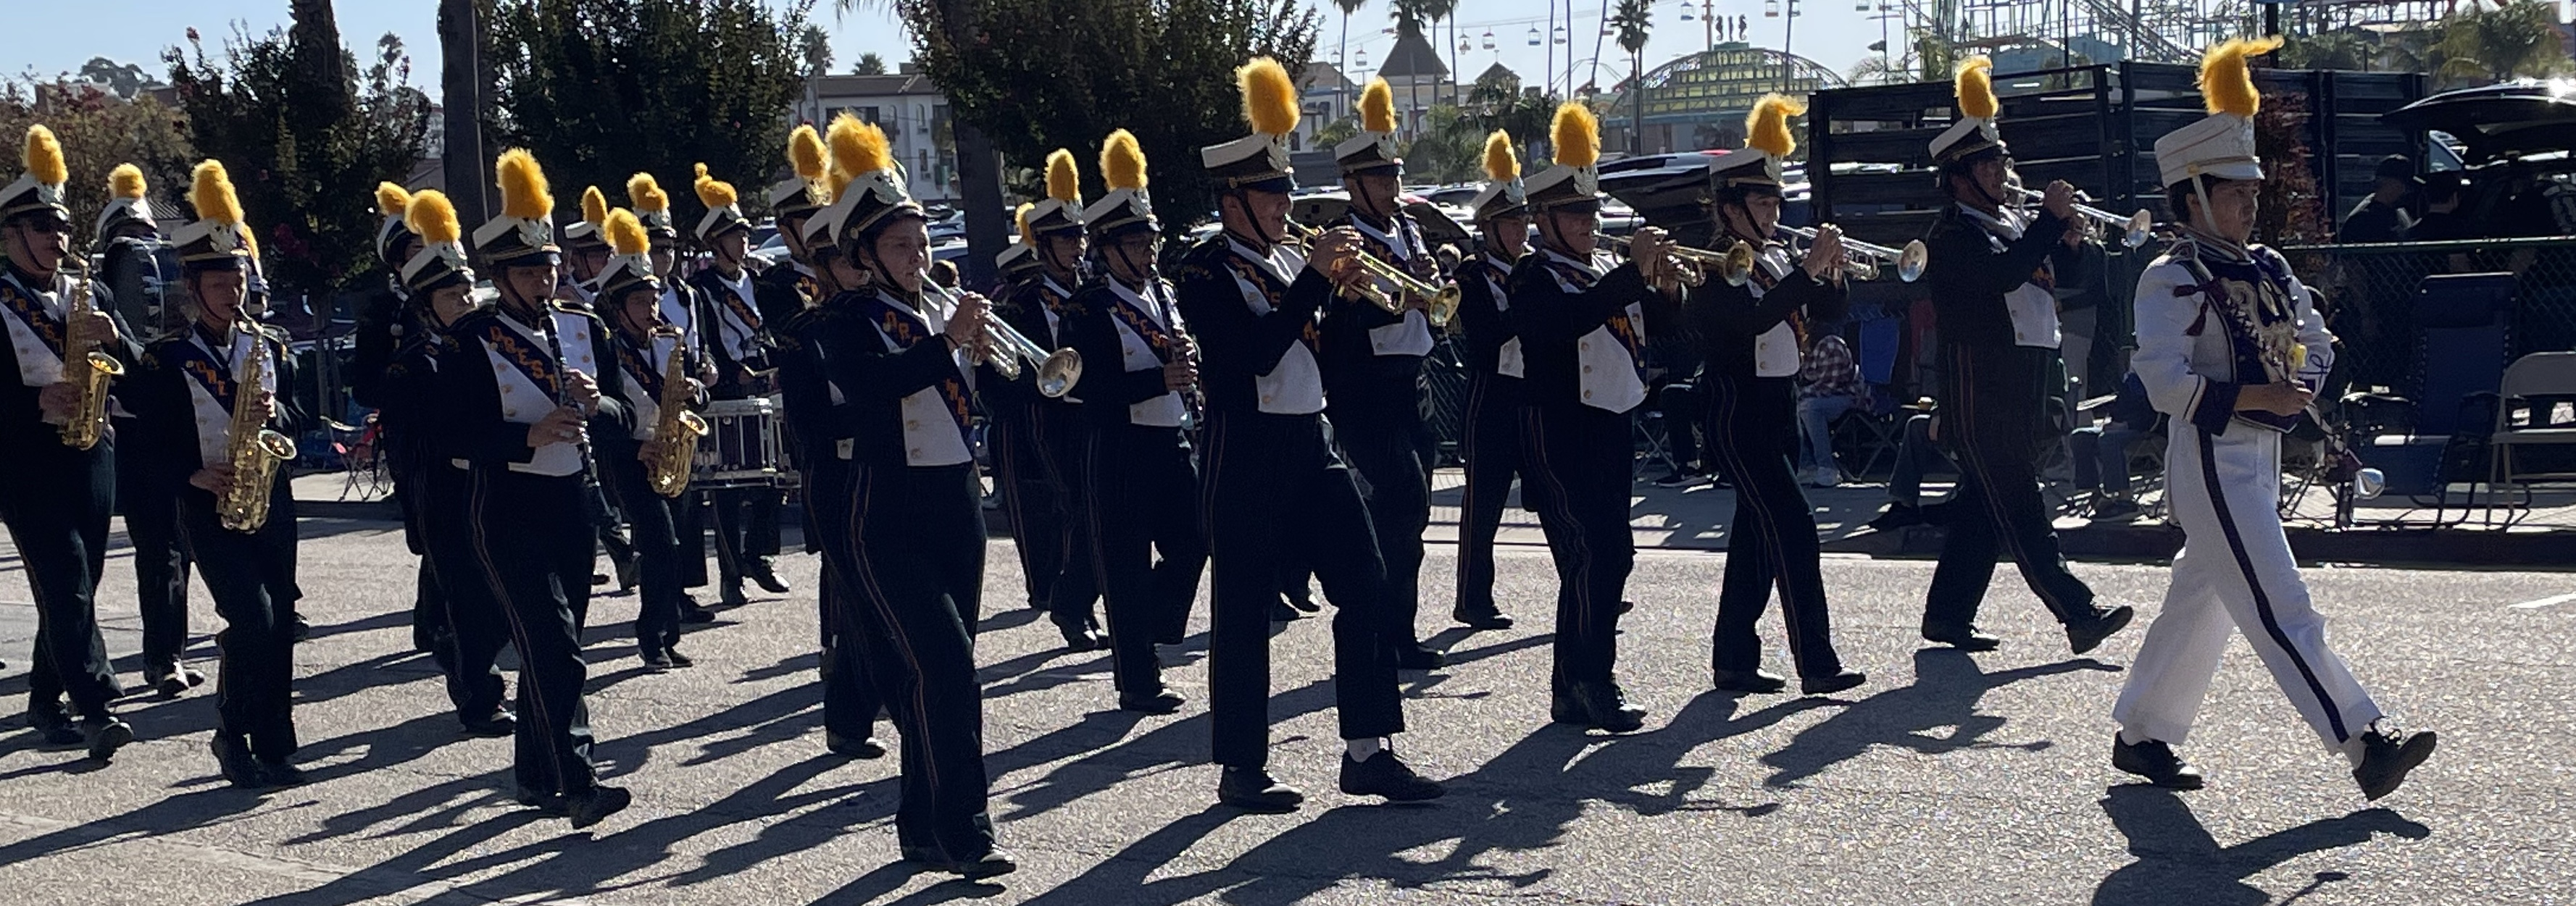 Orestimba Warrior marching Band